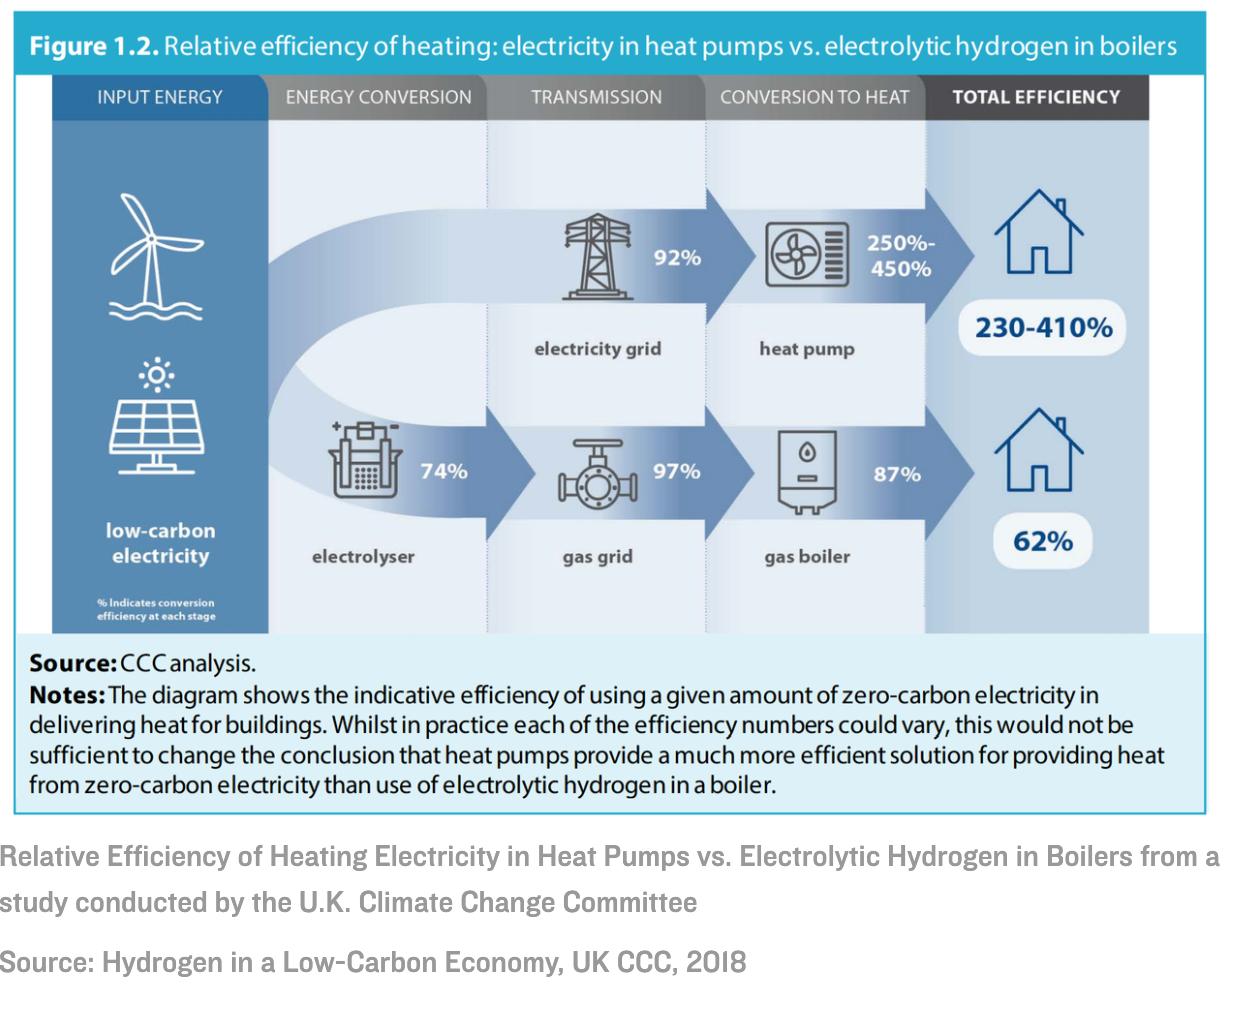 Relative Efficiency of Heating Electricity in Heat Pumps vs. Electrolytic Hydrogen in Boilers